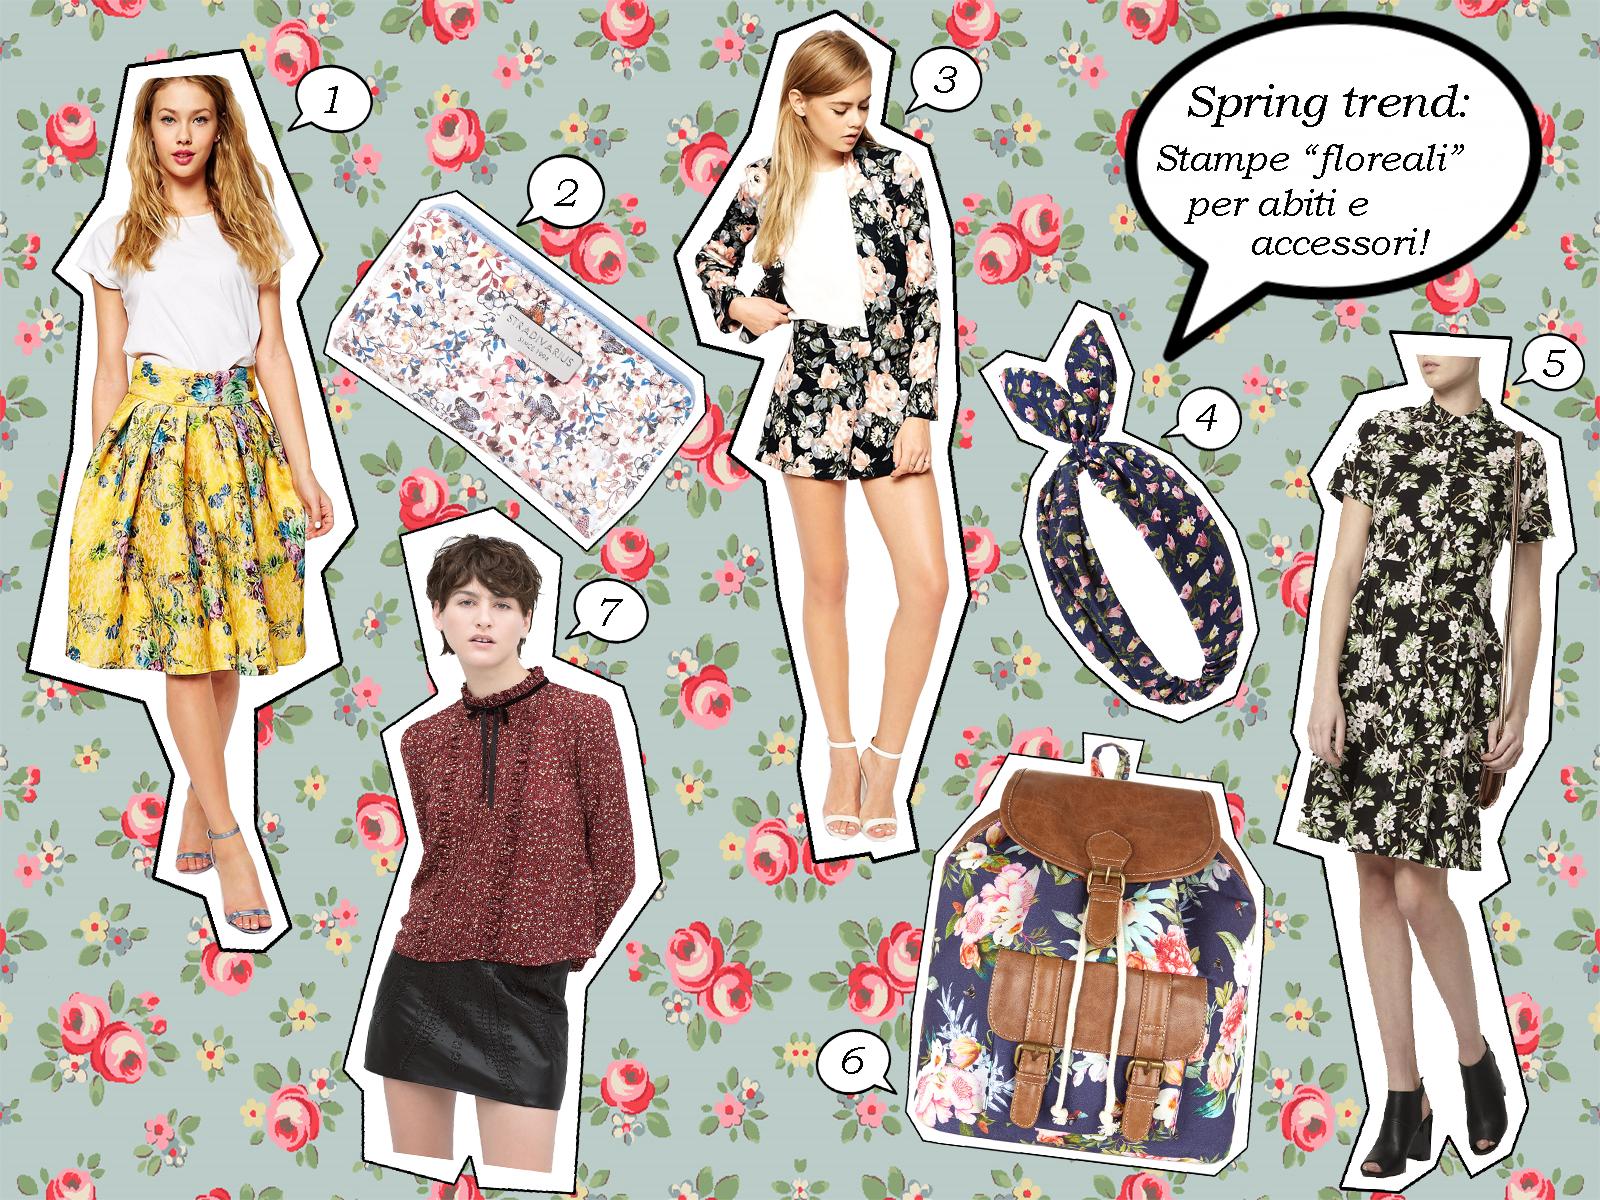 tendenze primavera 2015